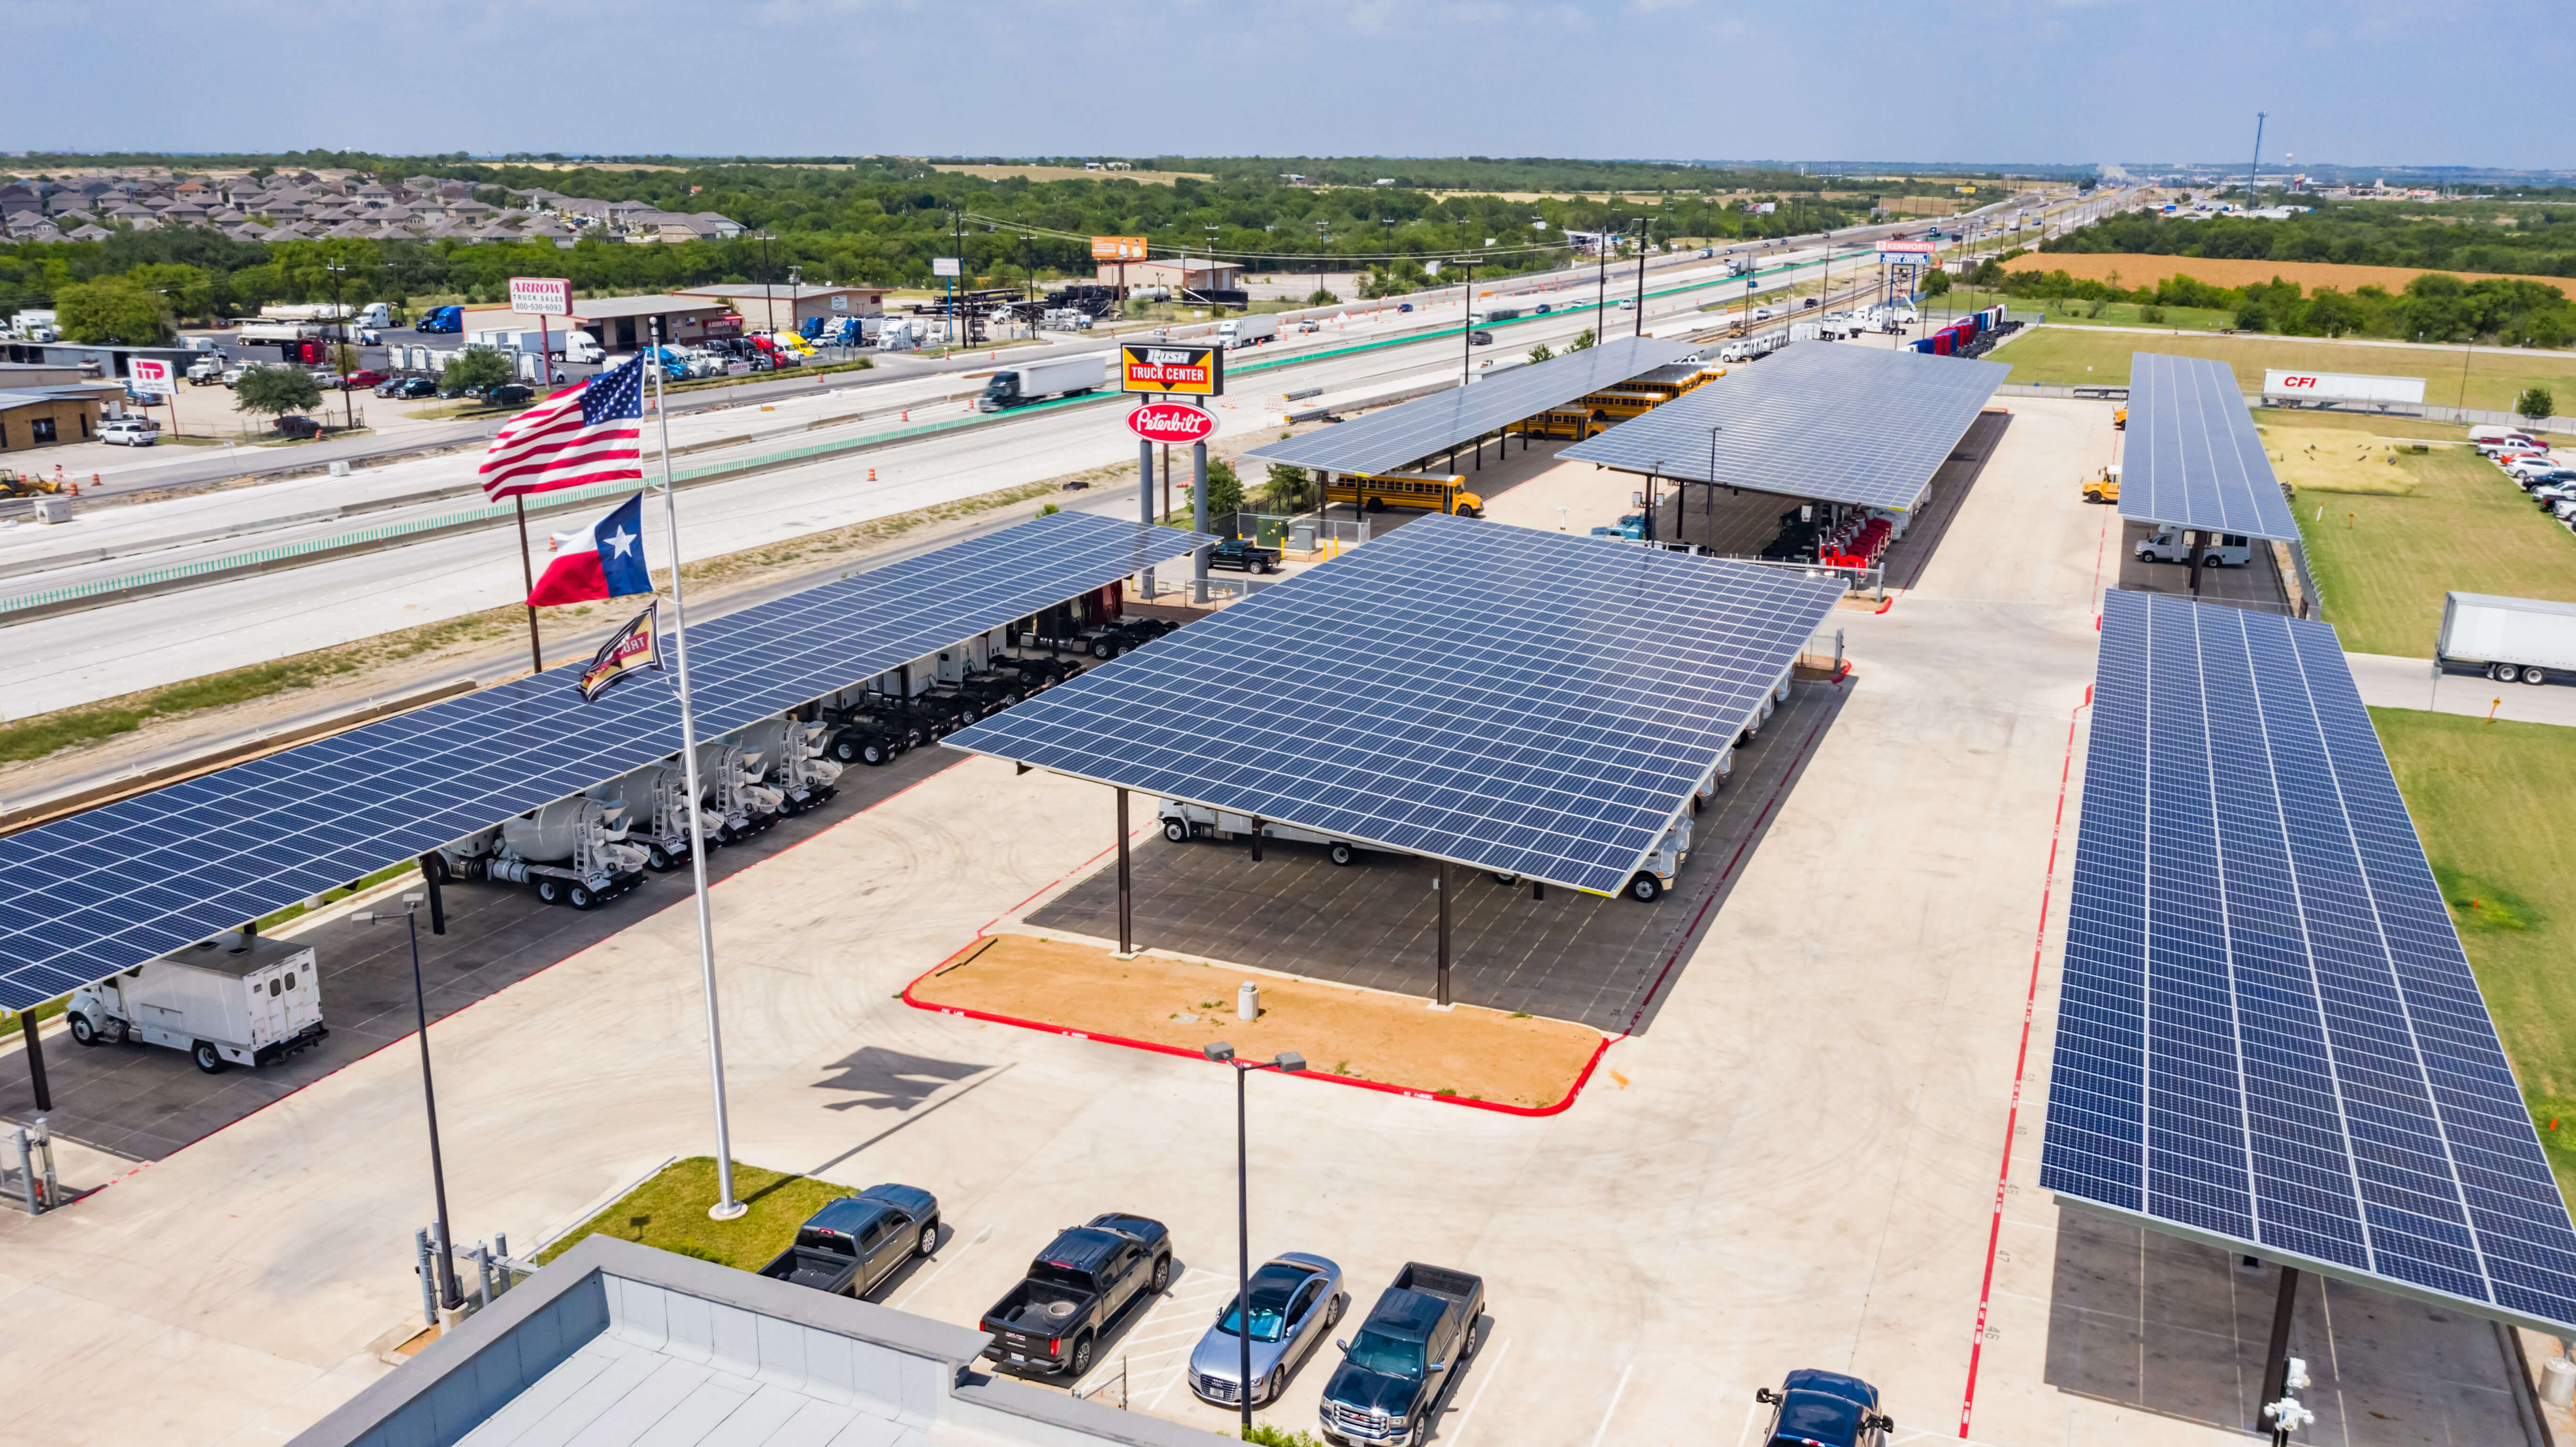 Rush Enterprises Solar Carports, Largest Solar Carports in Texas